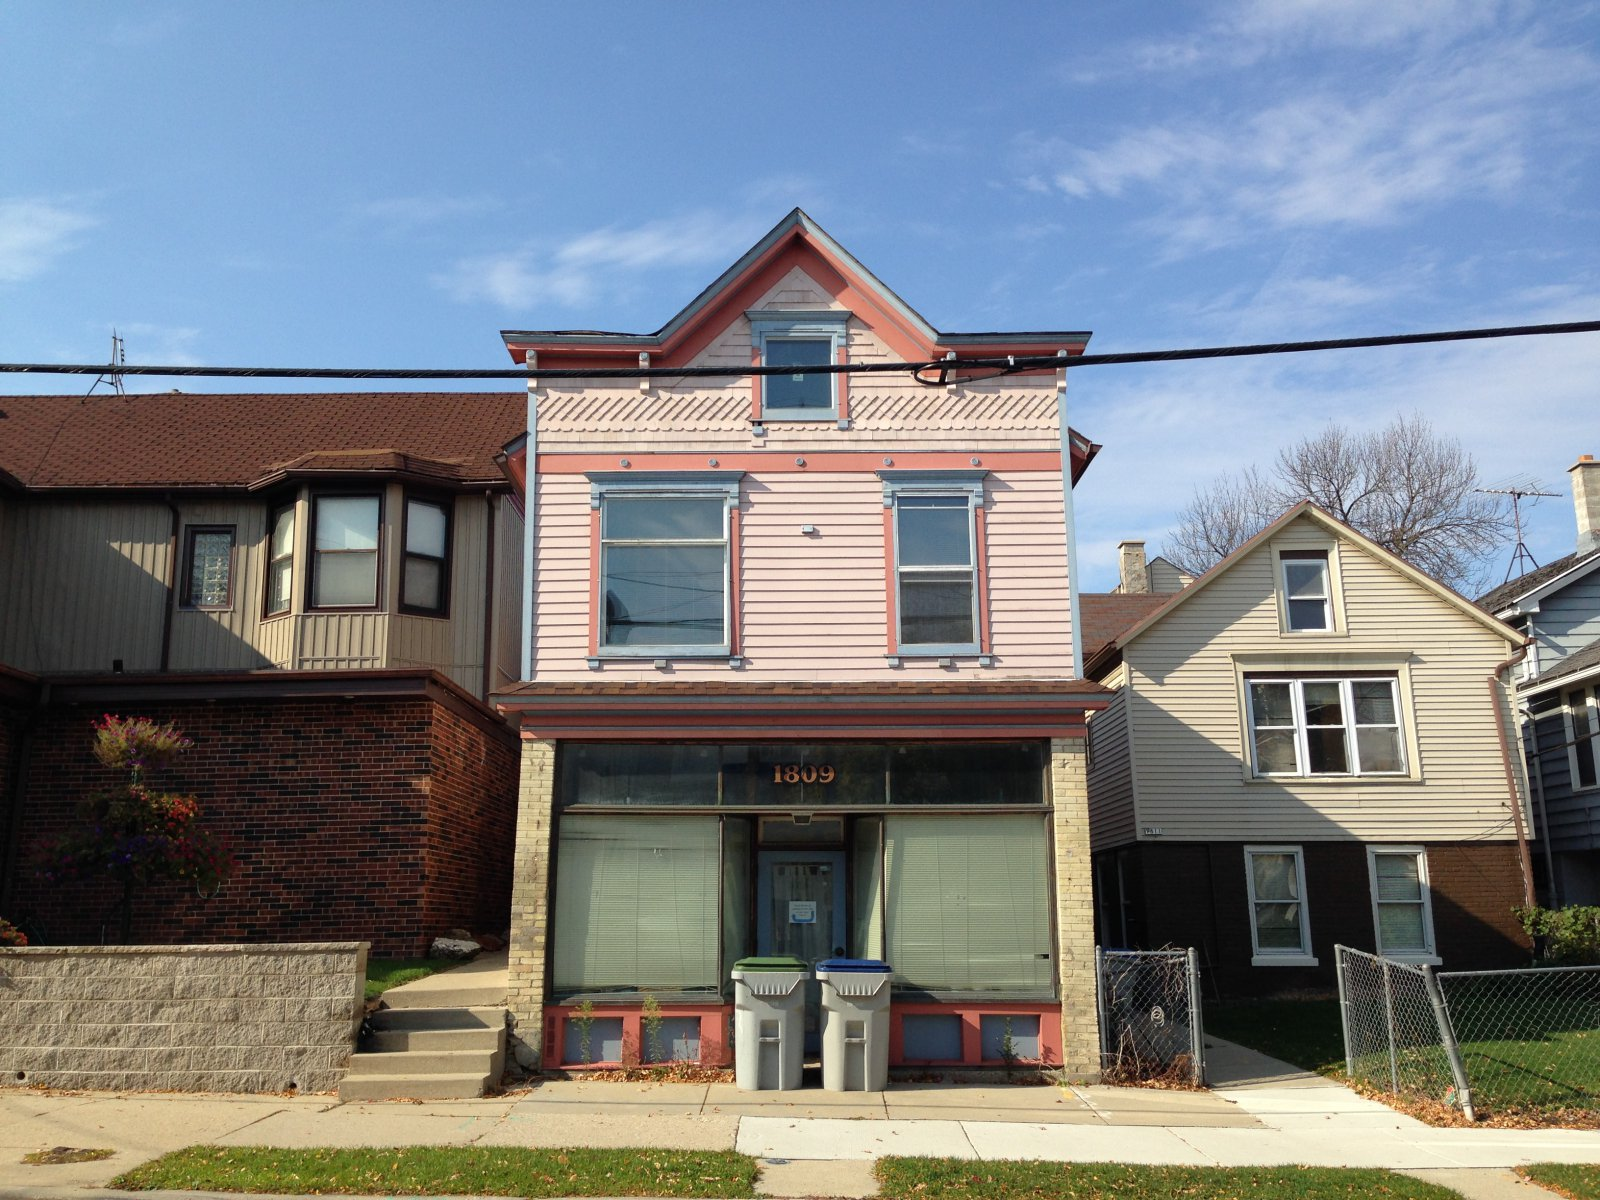 1809 N. Humboldt Ave.